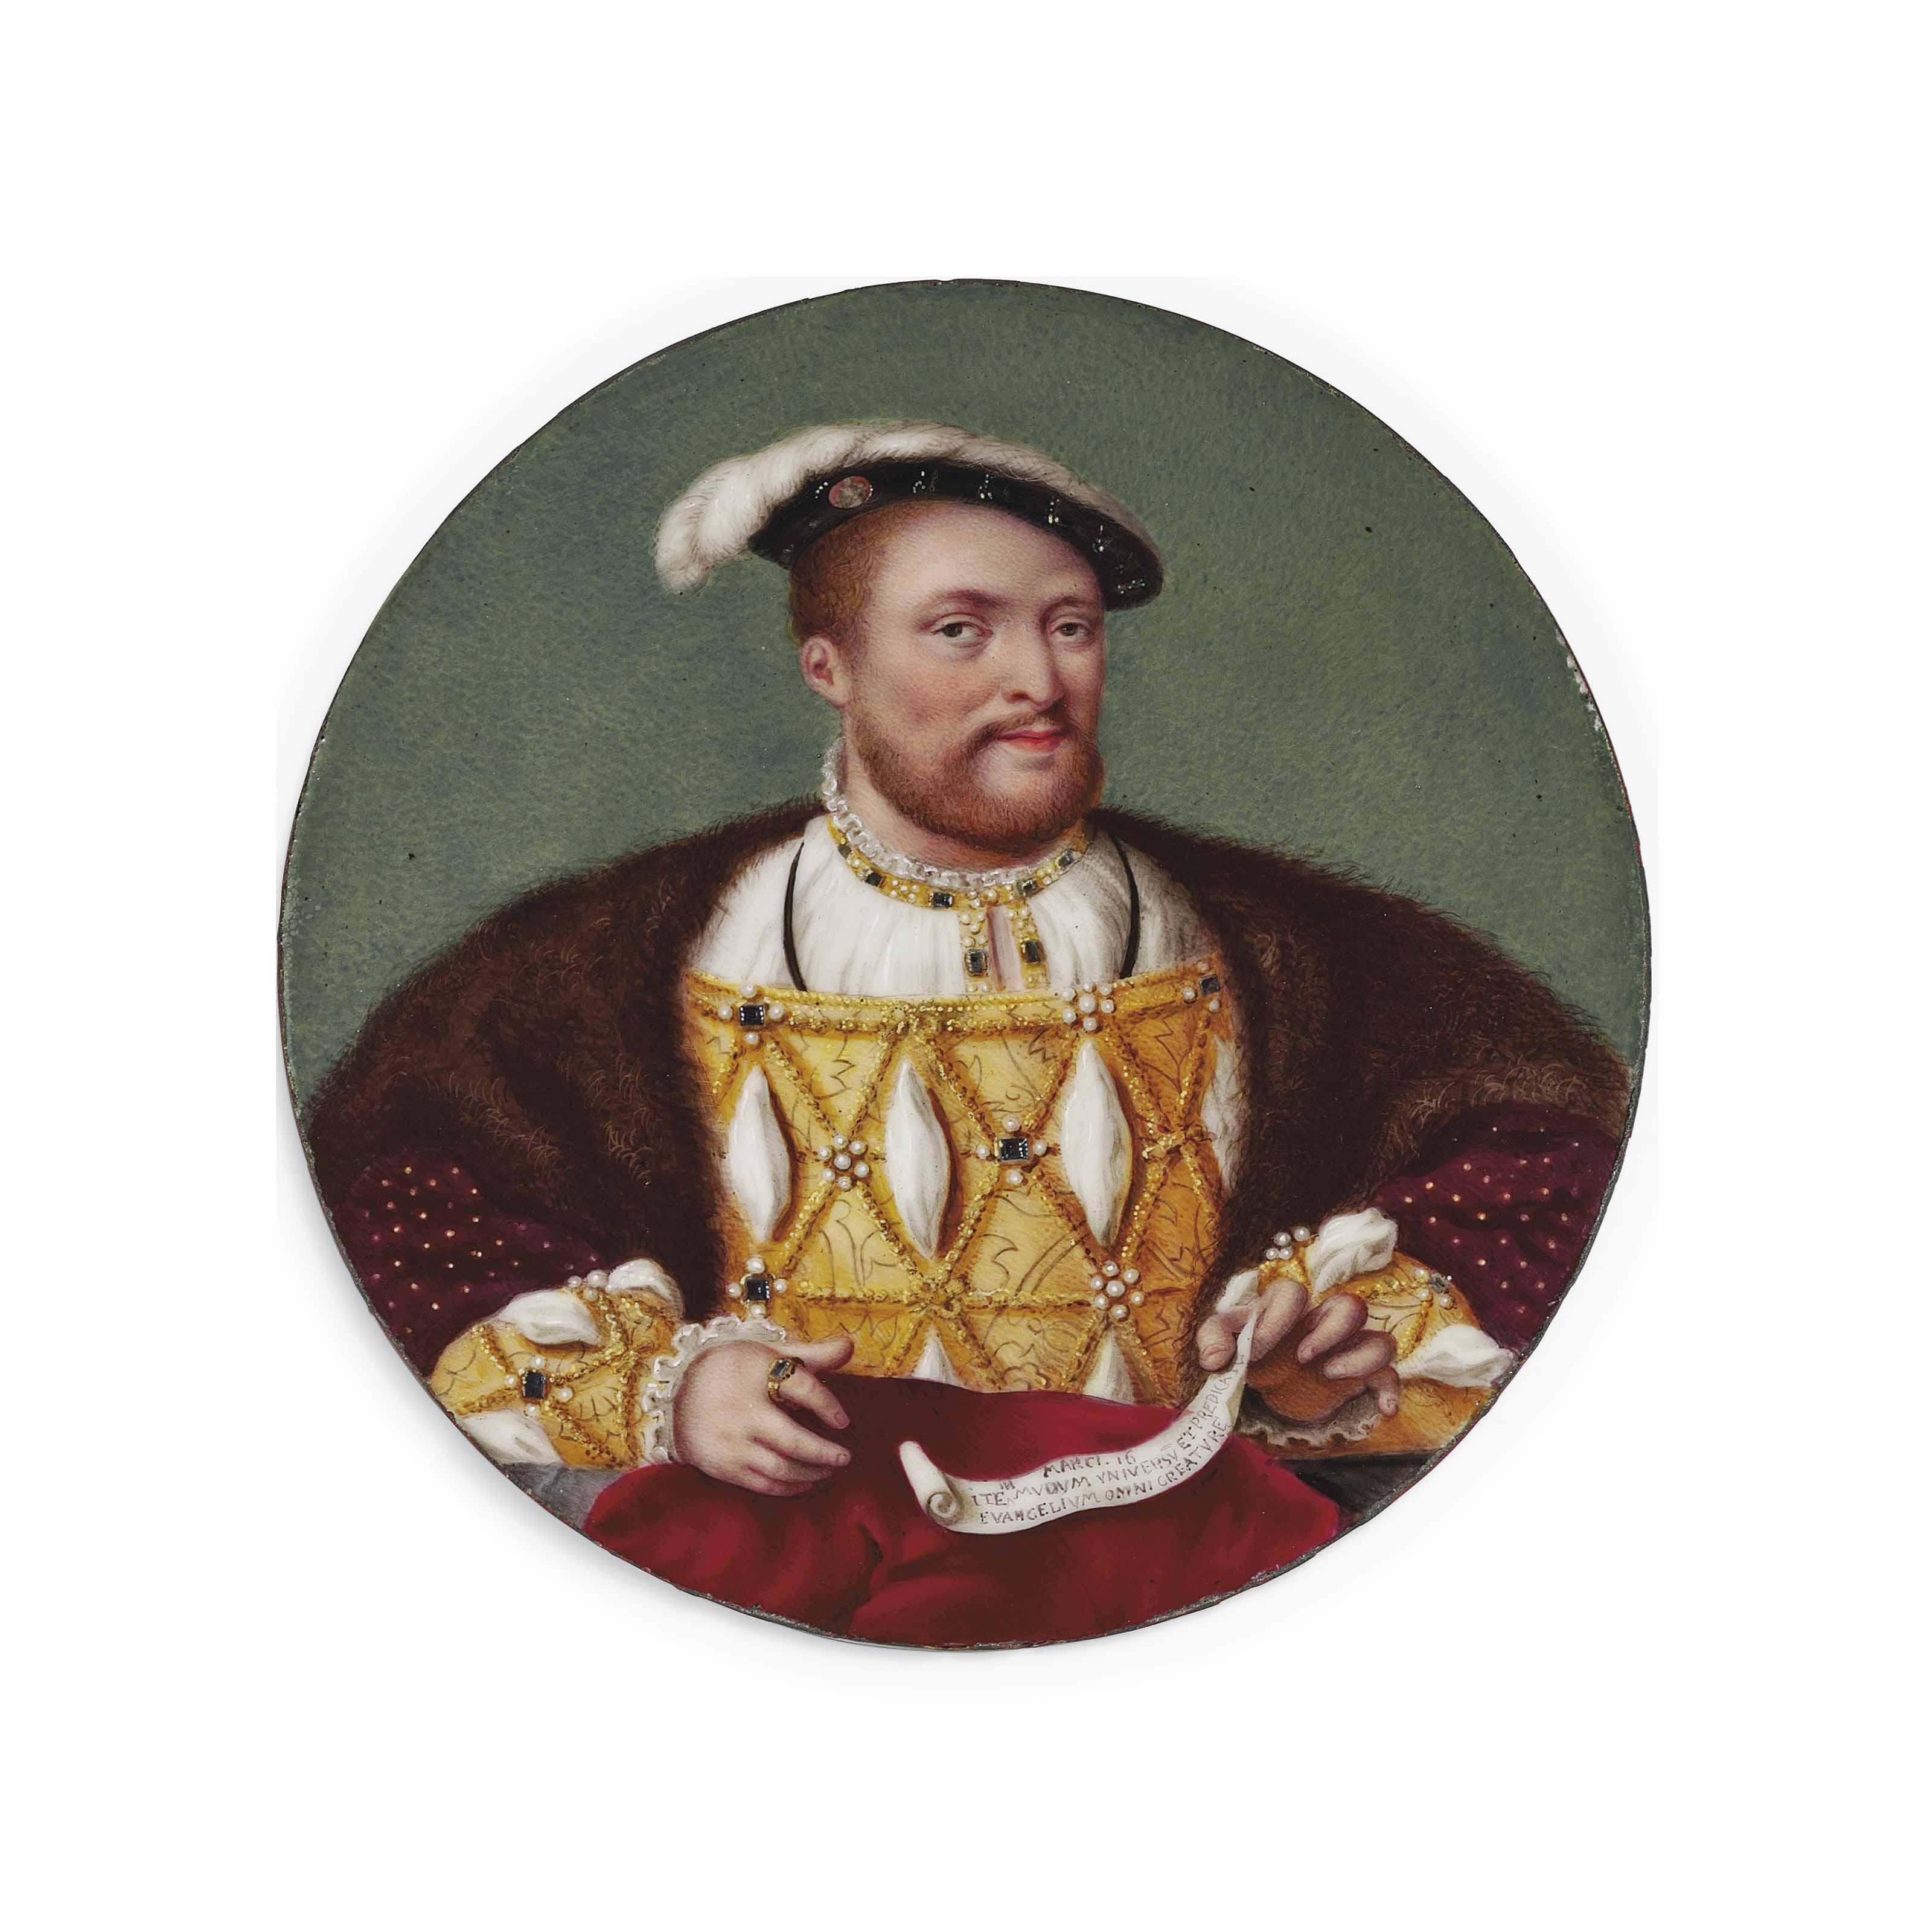 JOHANN HEINRICH HURTER (SWISS, 1734-1799) AFTER JOOS VAN CLEVE (FLEMISH, 1485/90 - 1540/41)